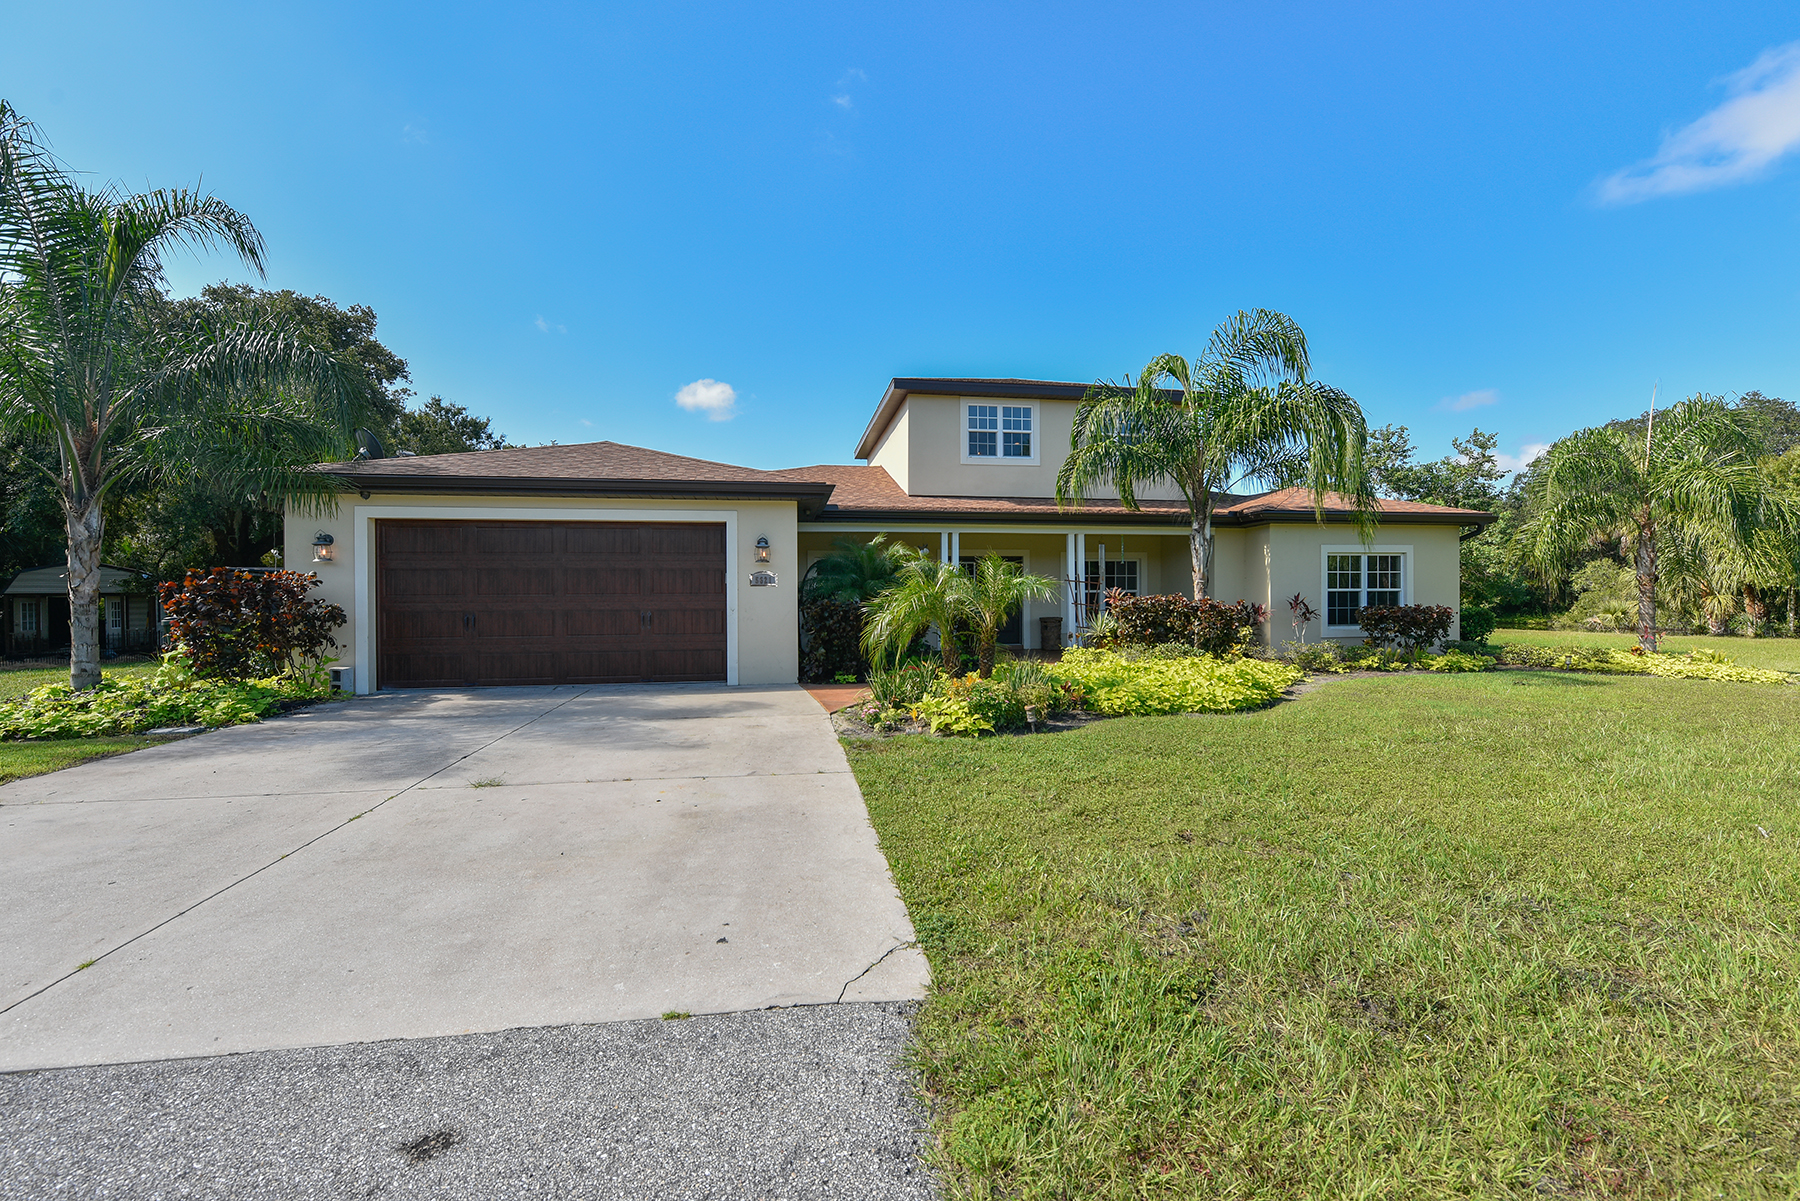 Single Family Home for Sale at NORTH PORT ESTATES 5621 Garrison Ave North Port, Florida, 34291 United States